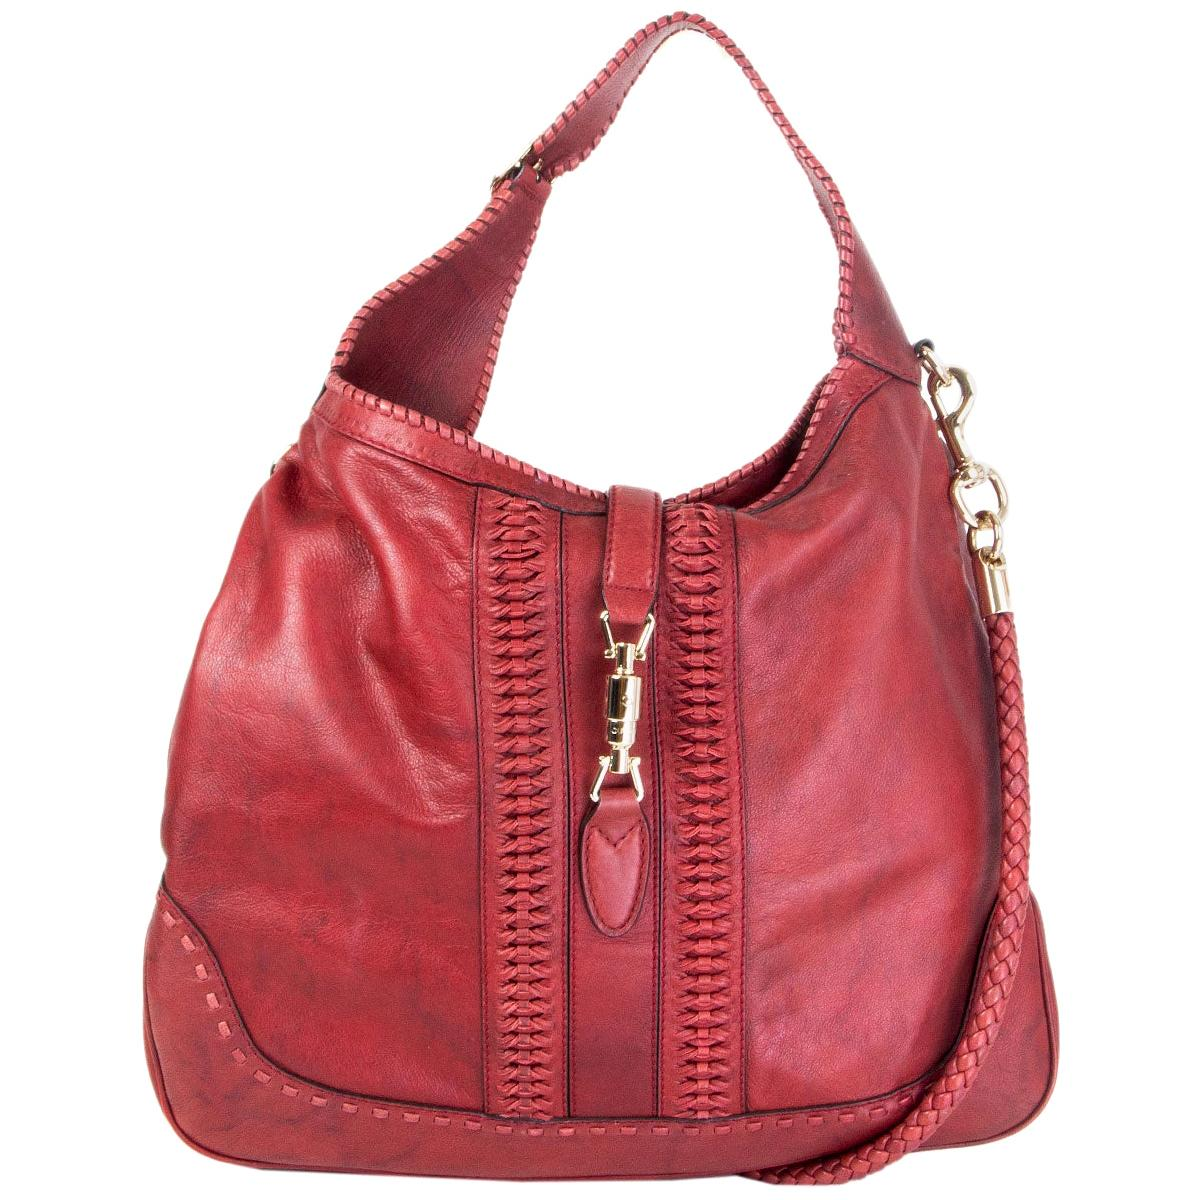 GUCCI x GREEN CARPET CHALLENGE burgundy leather NEW JACKIE LARGE HOBO Bag